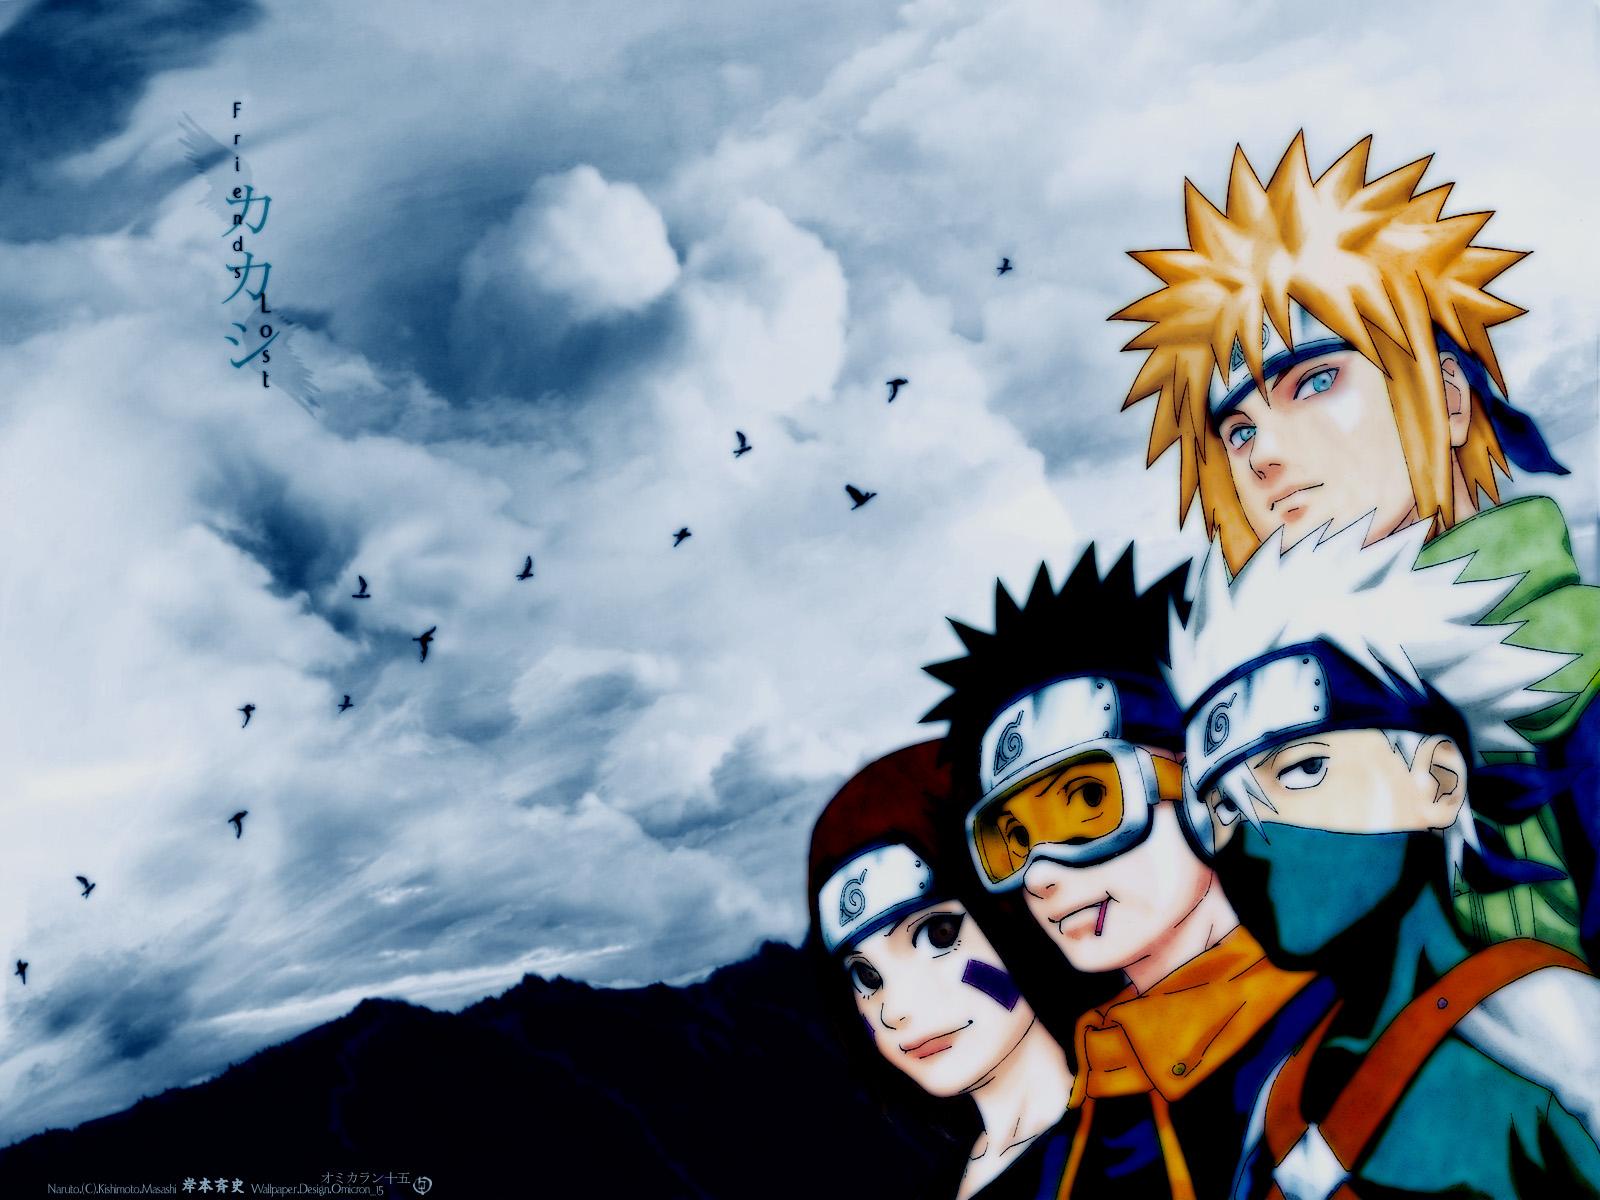 Naruto Shippuden HQ Wallpapers   Fondos de Pantalla HD Naruto 1600x1200